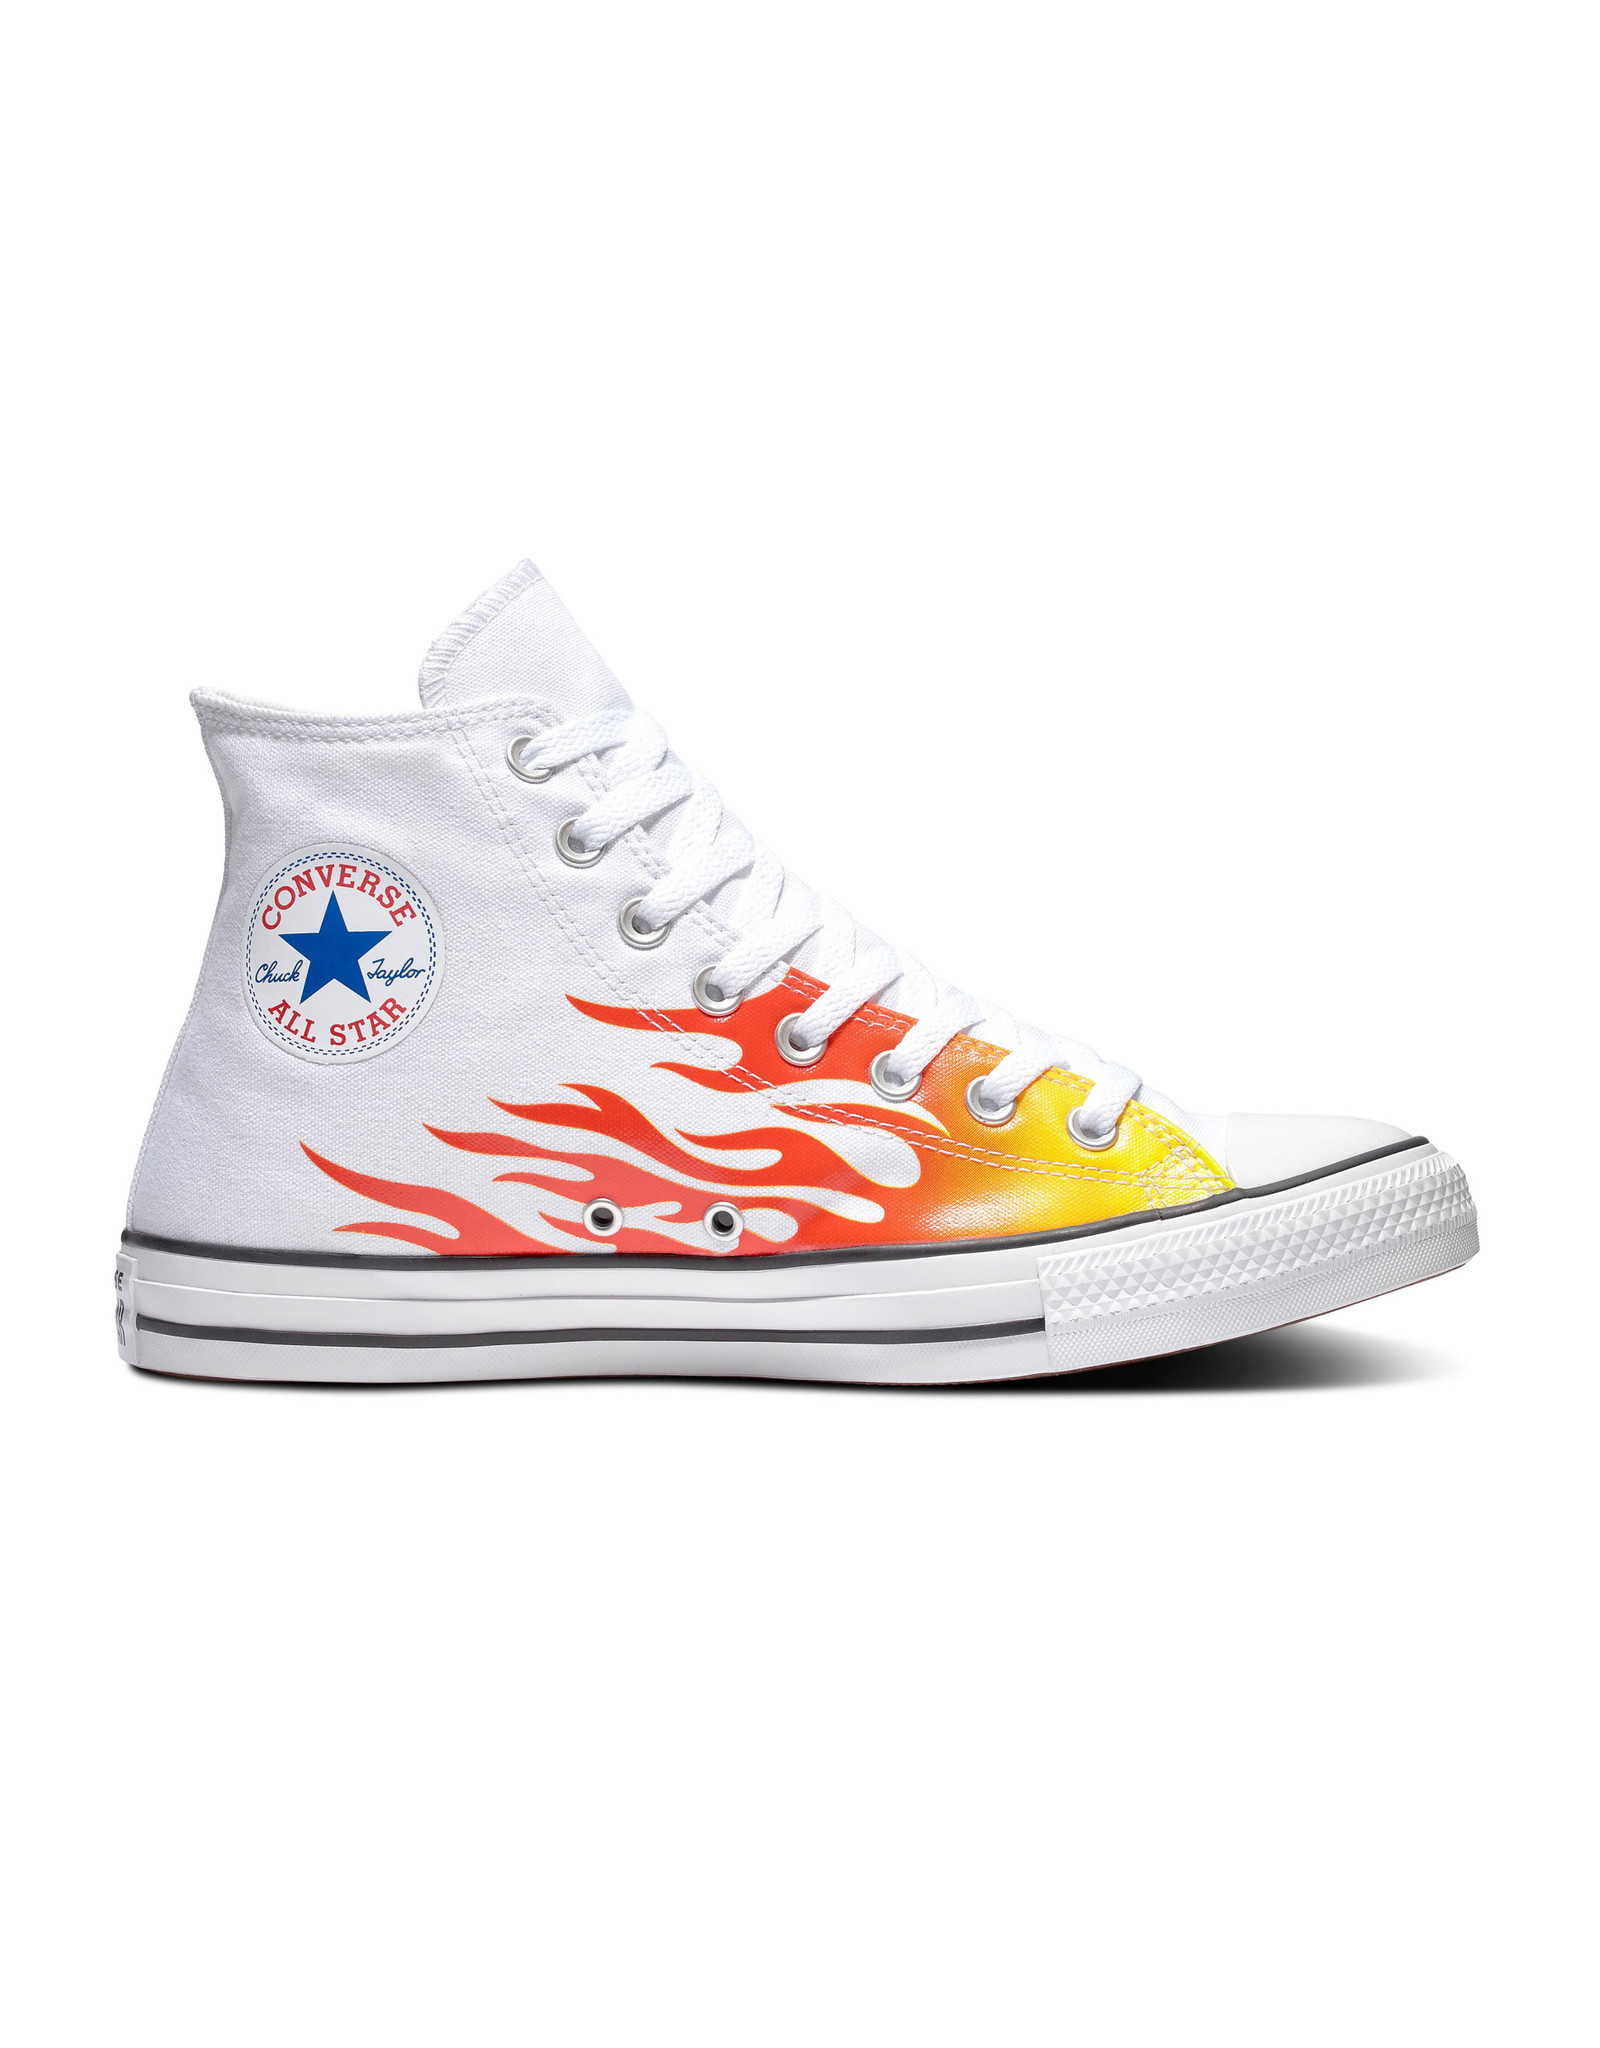 CONVERSE CHUCK TAYLOR ALL STAR HI WHITE/ENAMEL RED/FRESH YELLOW C19FLAW-166257C